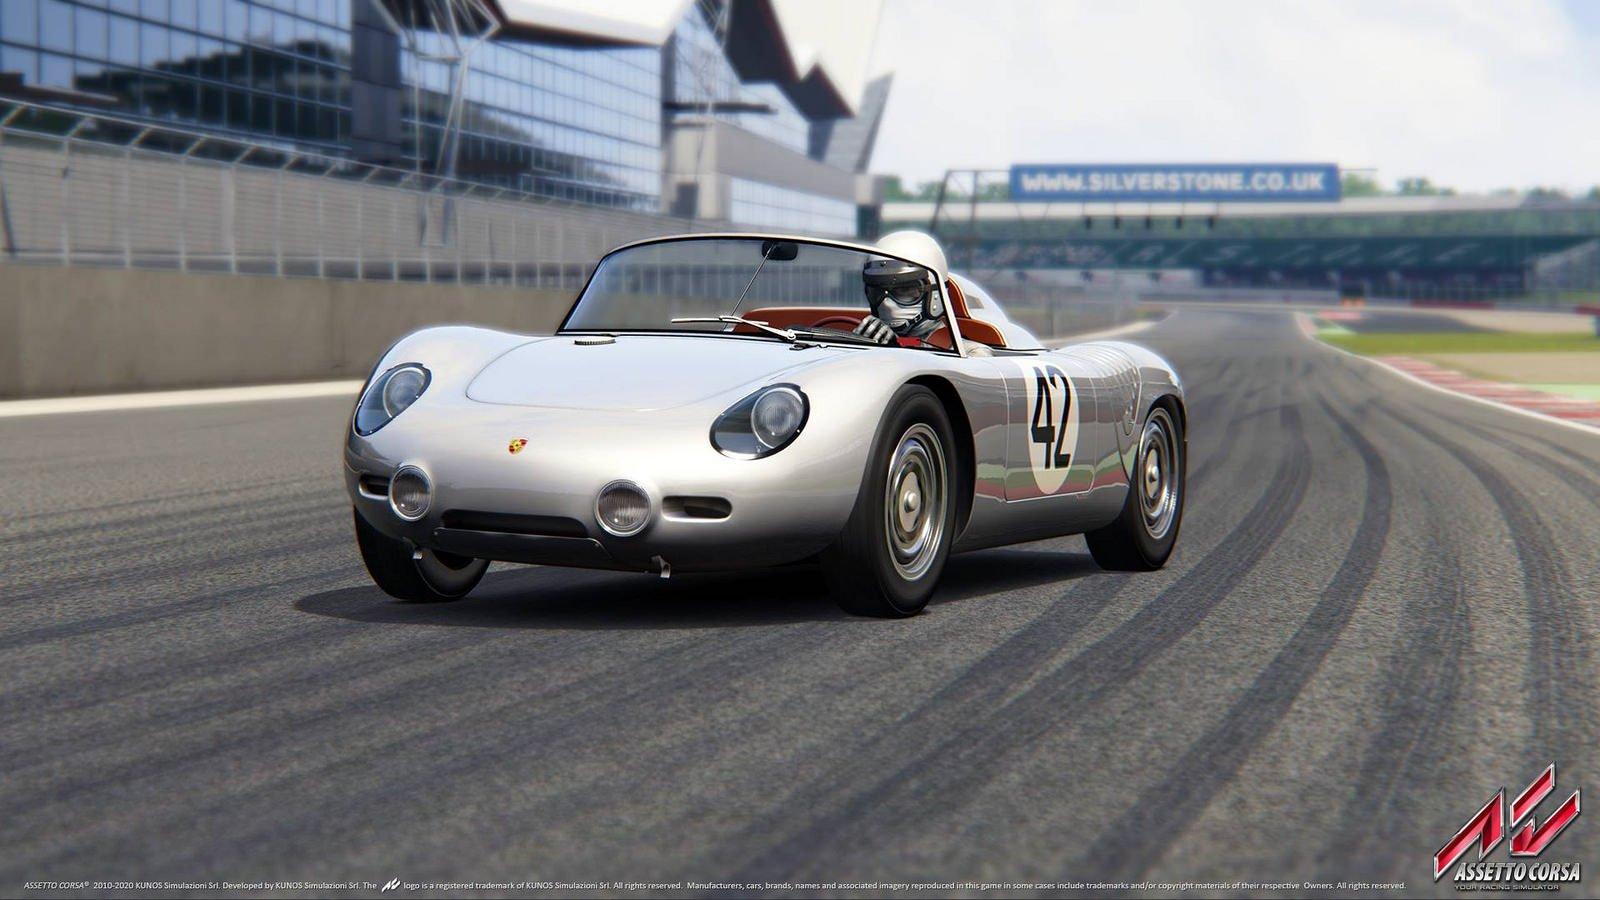 Assetto Corsa New Volume 2 Porsche Dlc Pack Images